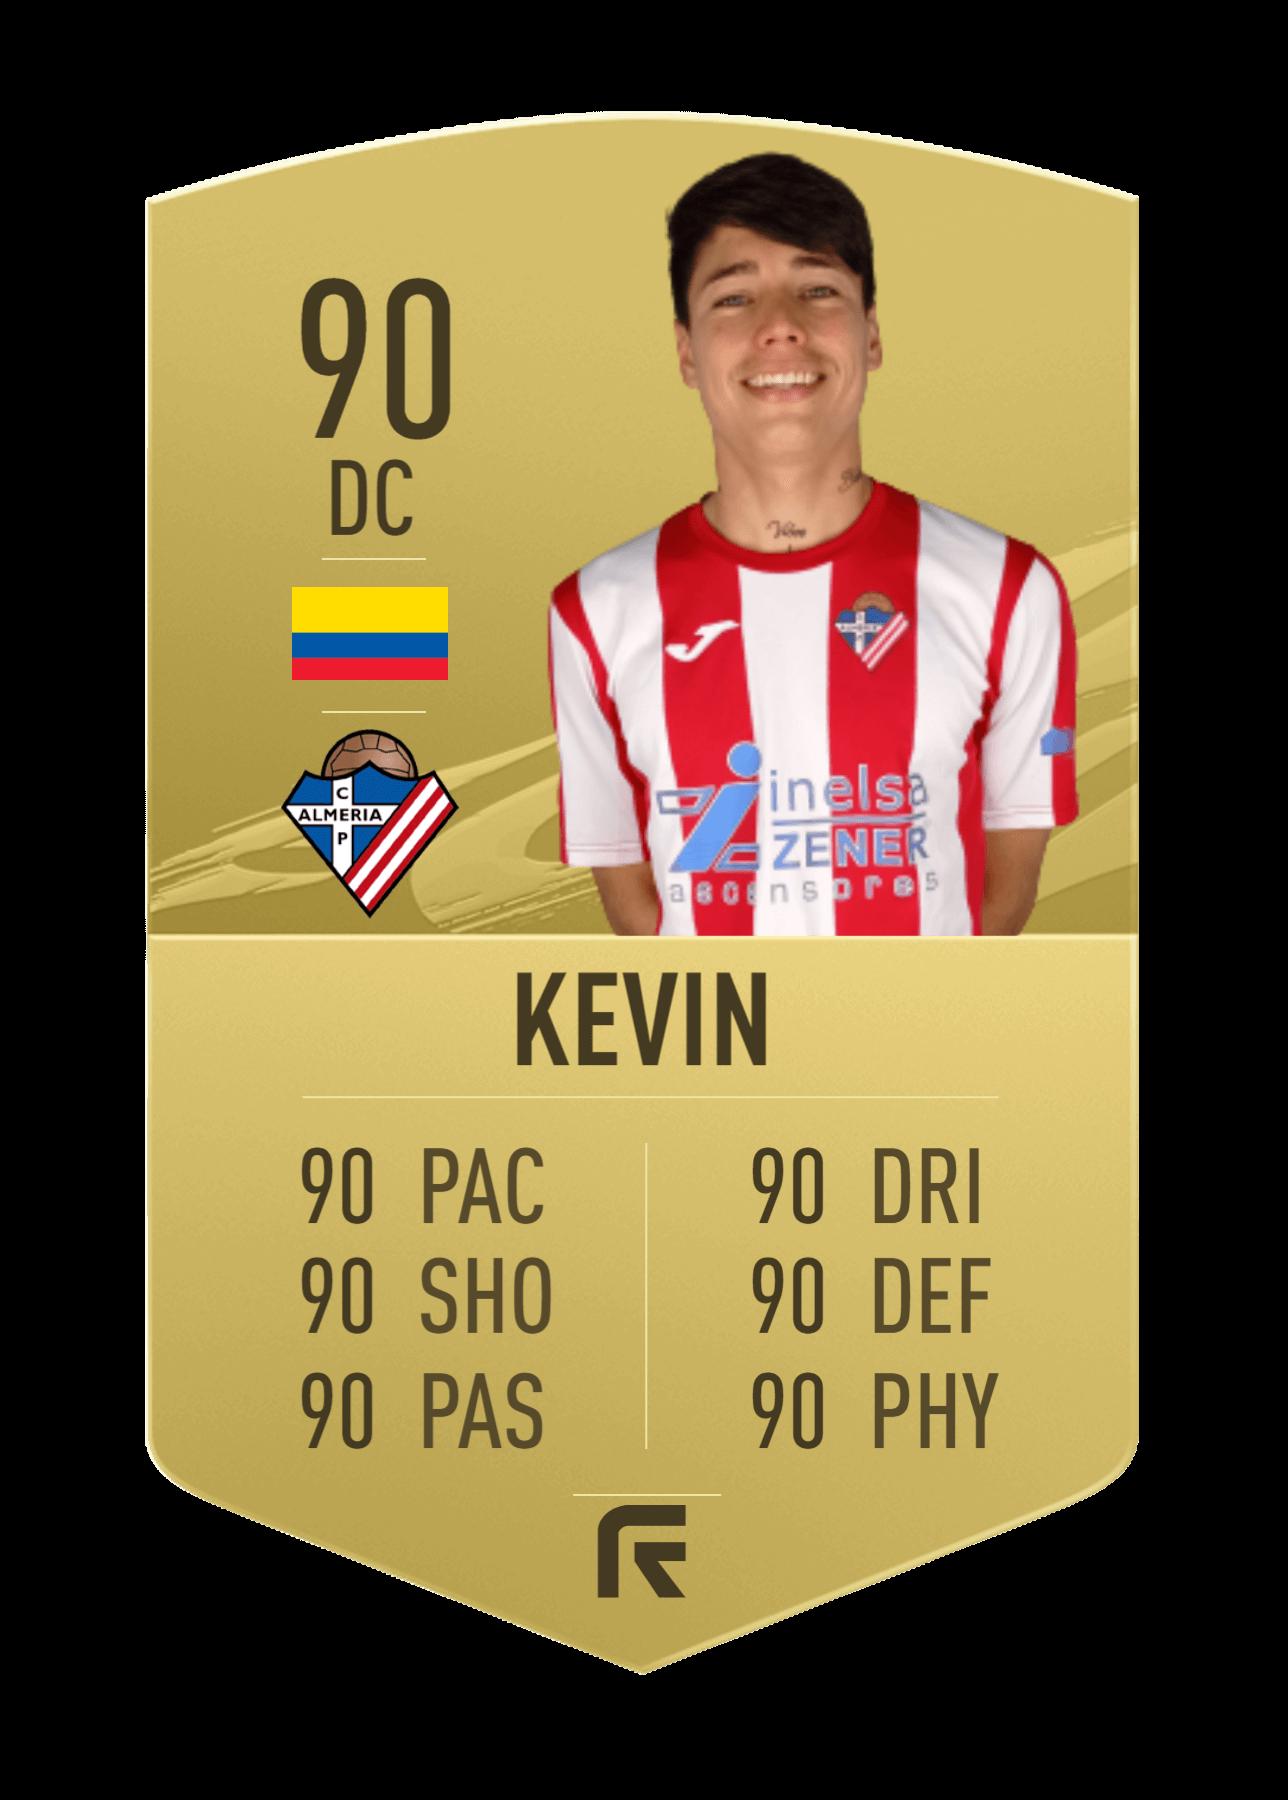 Kevin_cromo